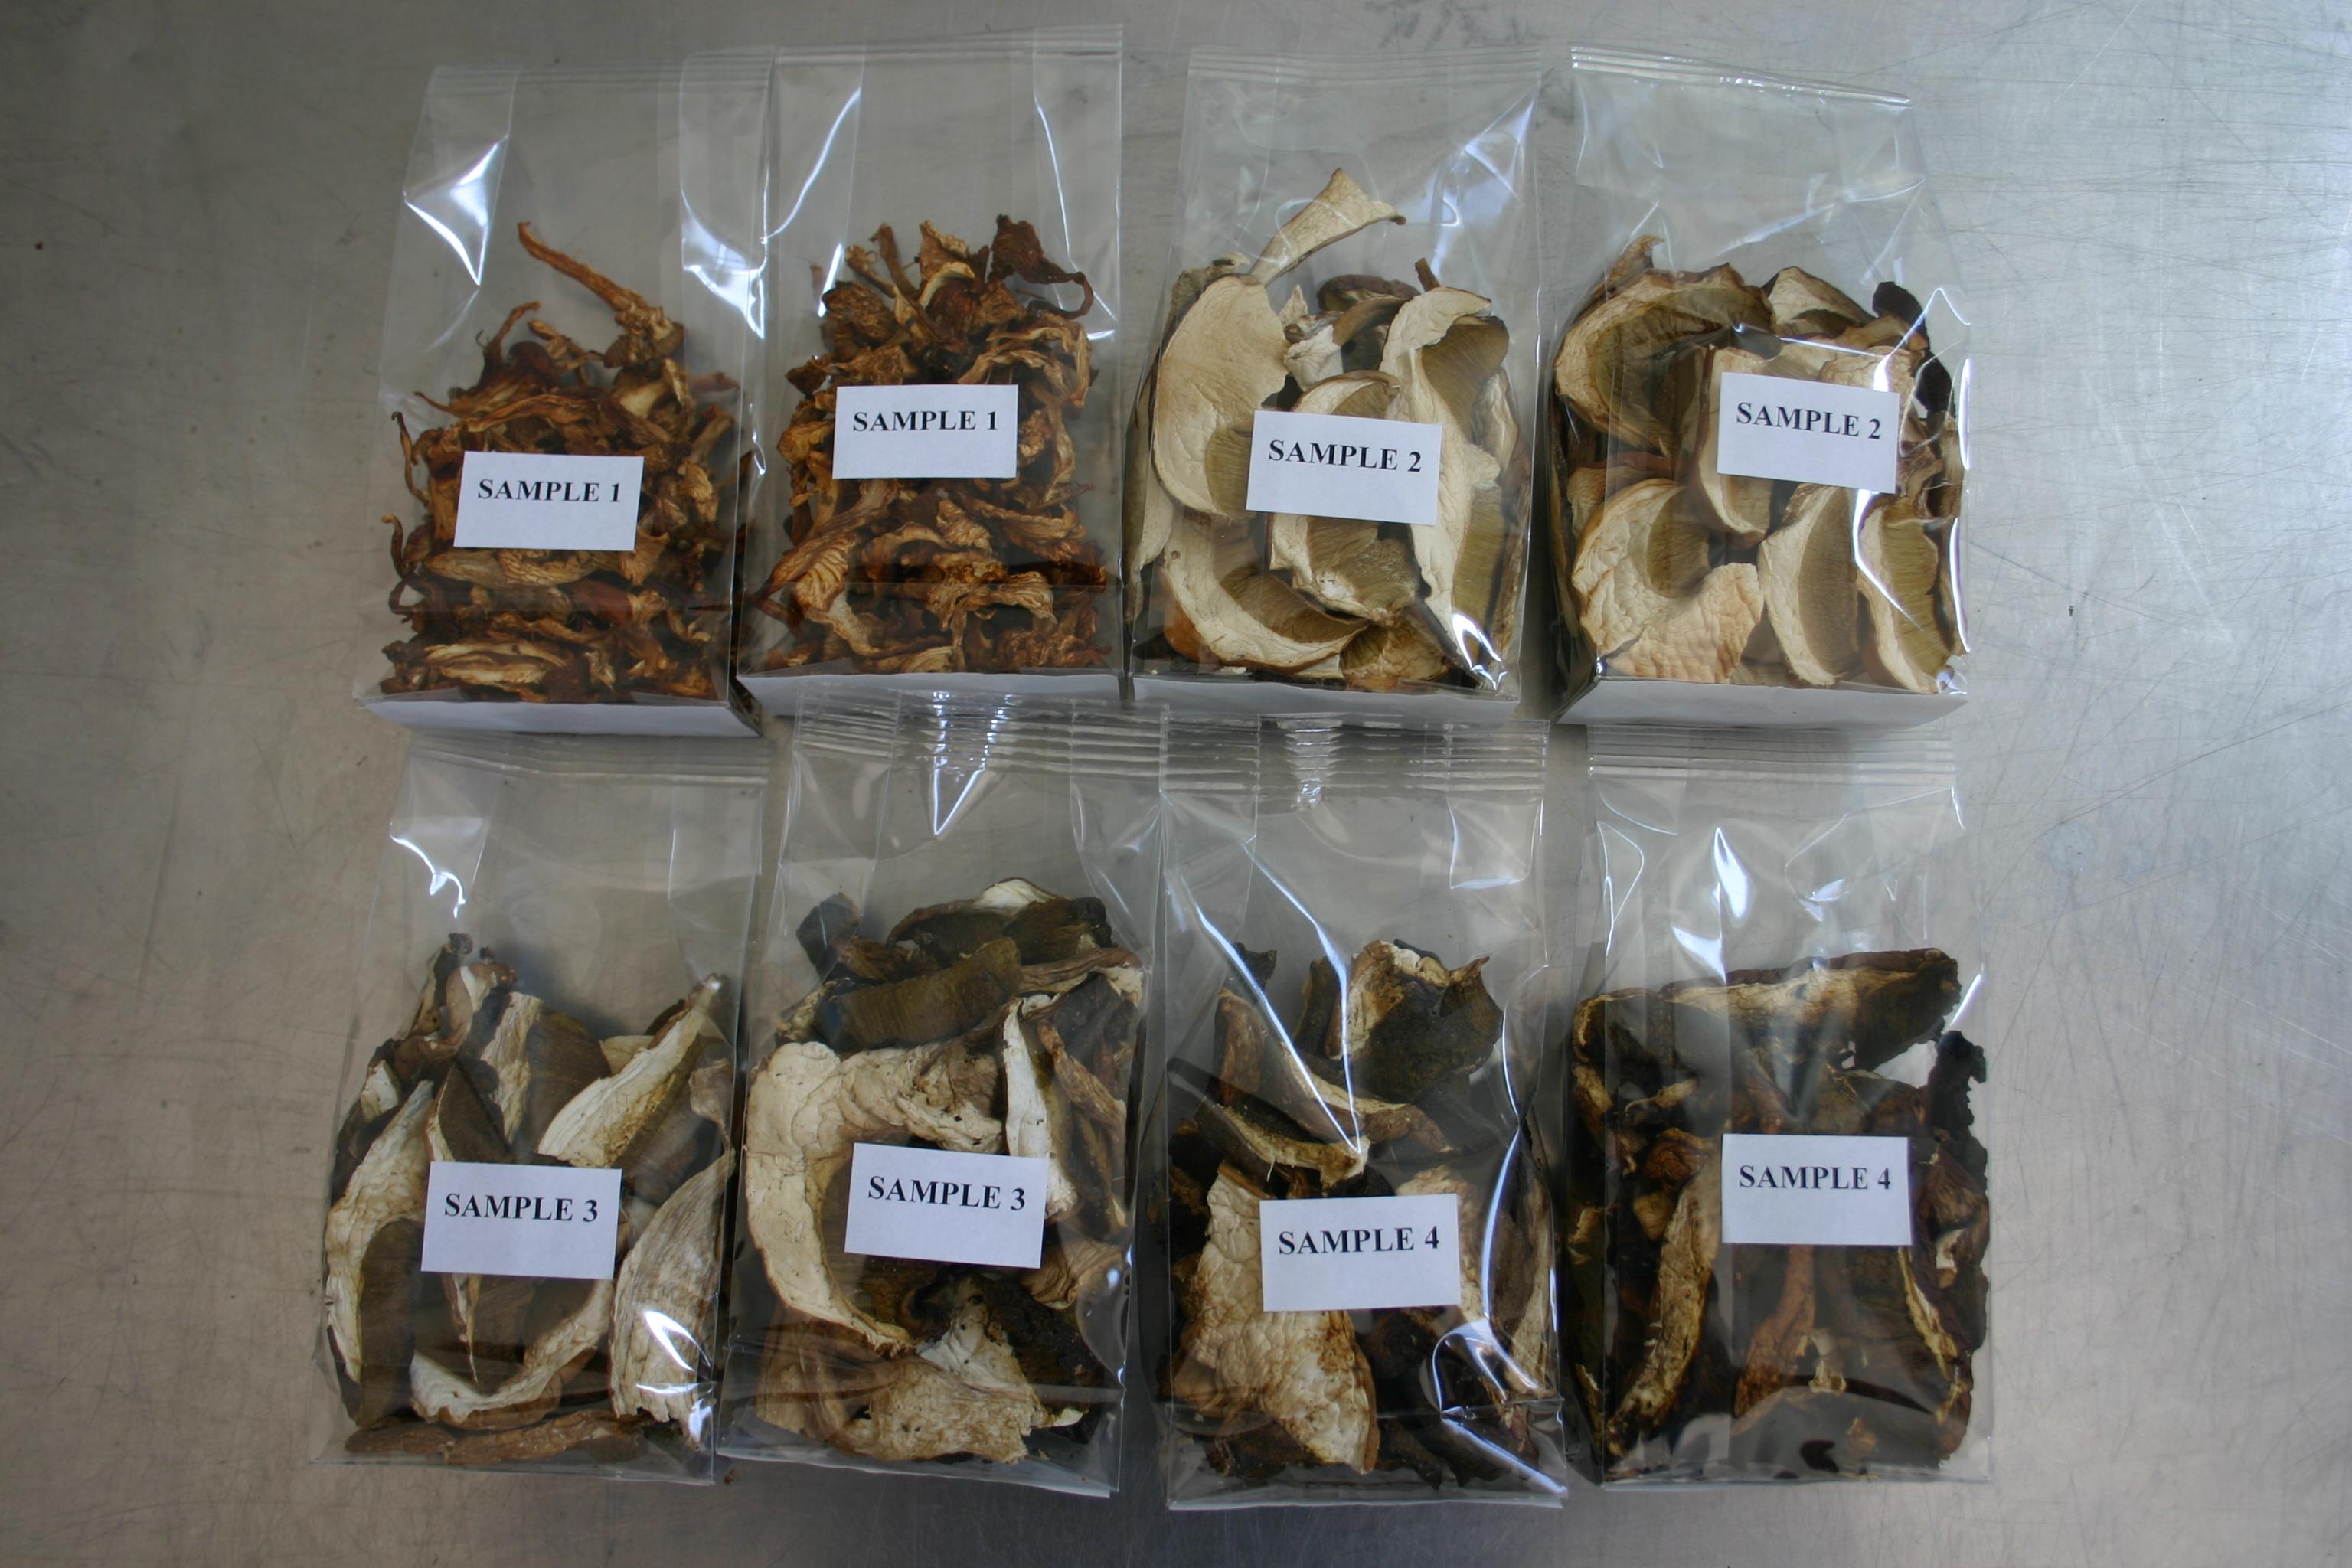 Samples Dried Mushrooms